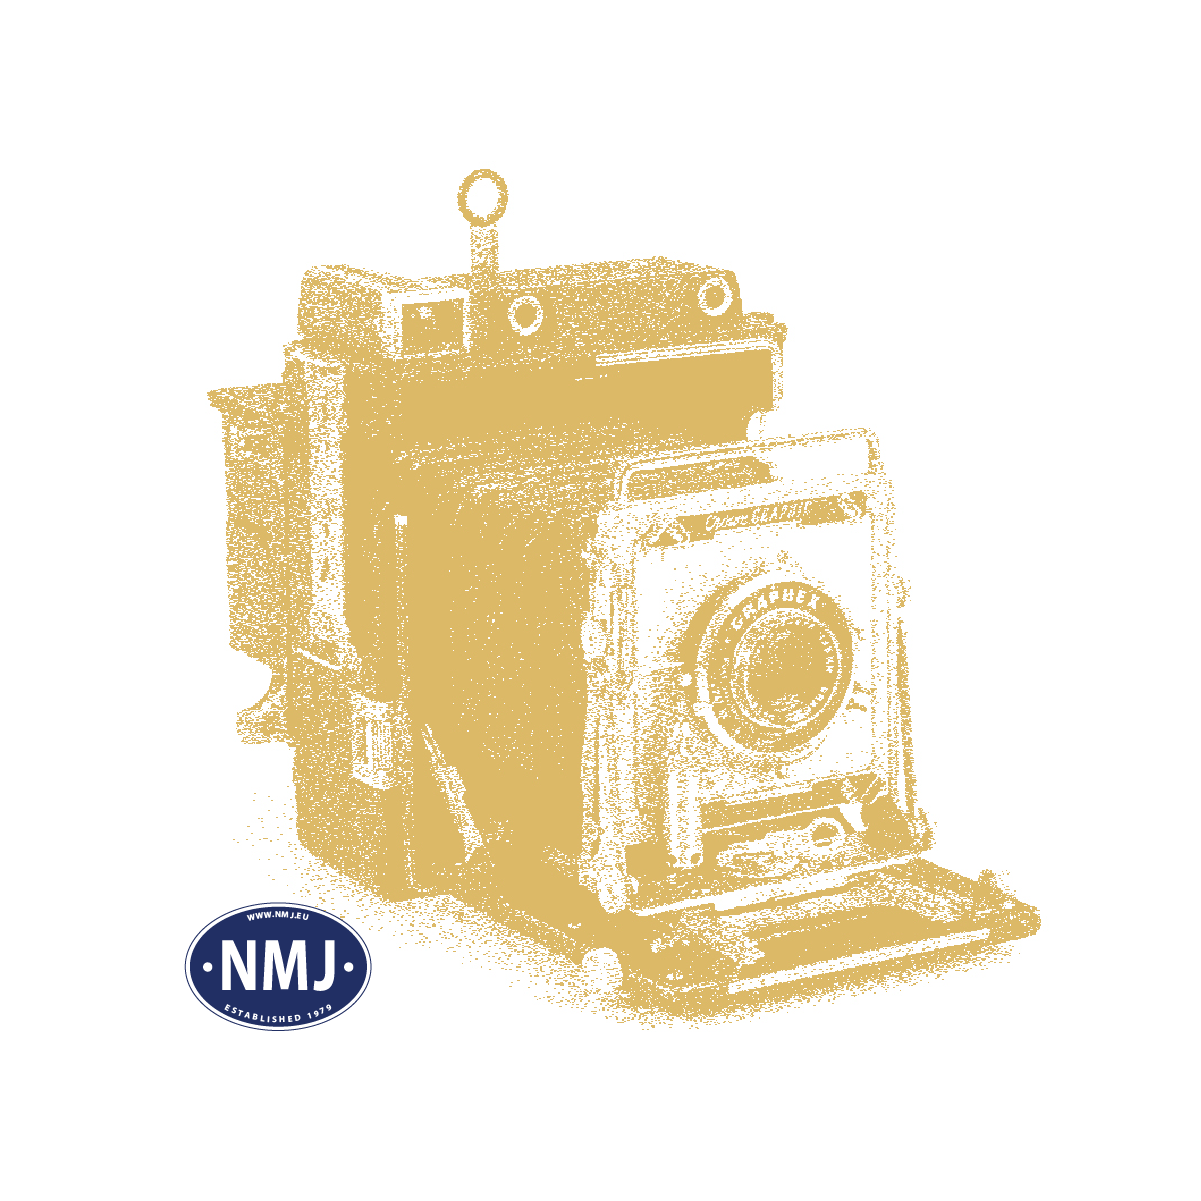 NMJT245301 - NMJ Topline CFL 1602, 0-Skala, DCC m/Lyd